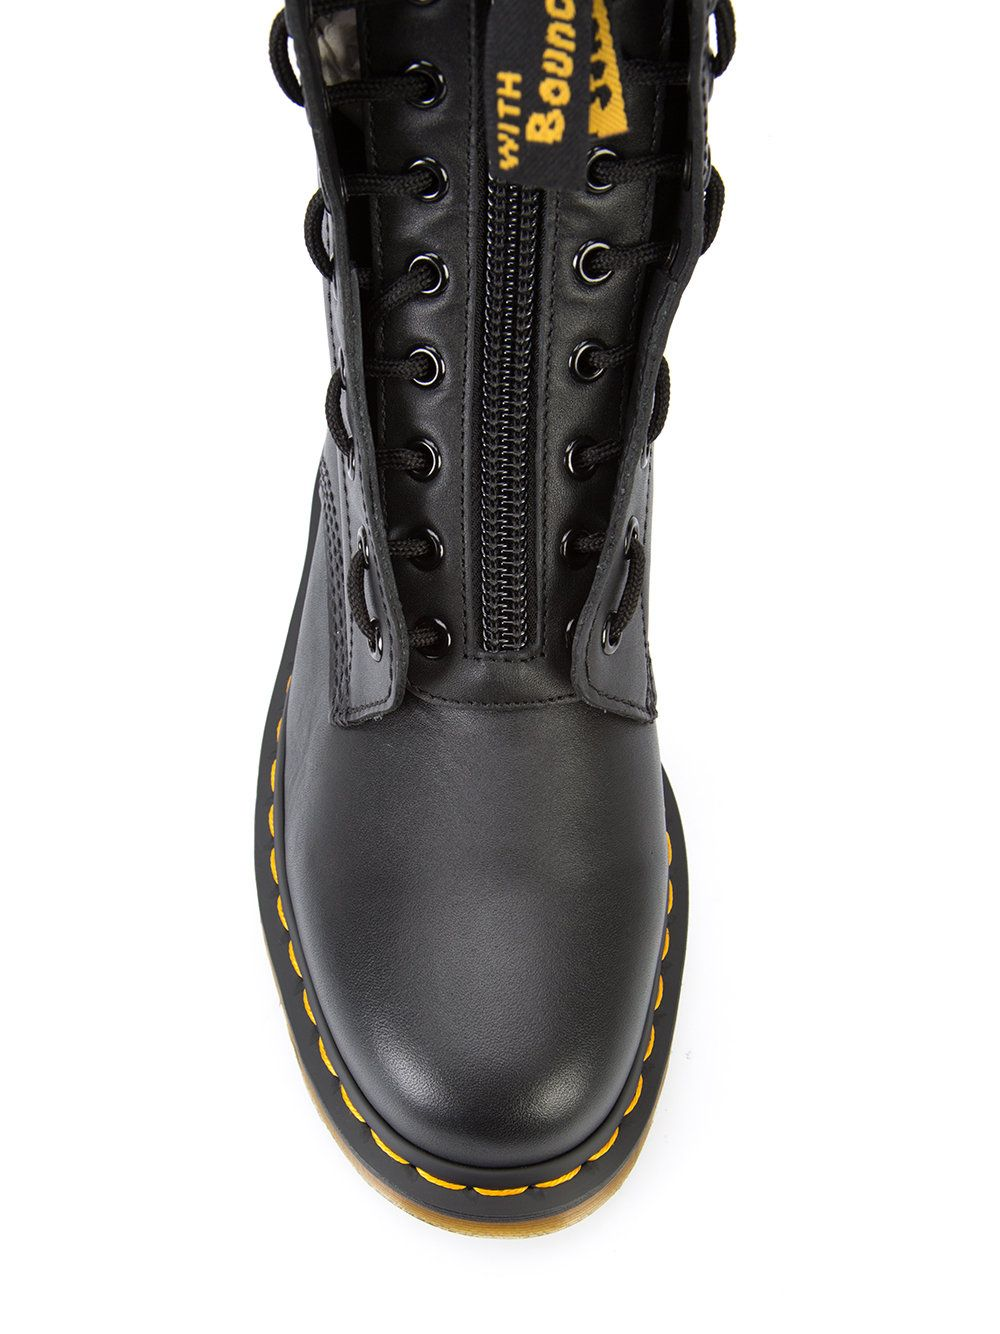 great look reputable site cheaper Yohji Yamamoto Dr. Martens Front Zip Boots | Dr. martens, De frente